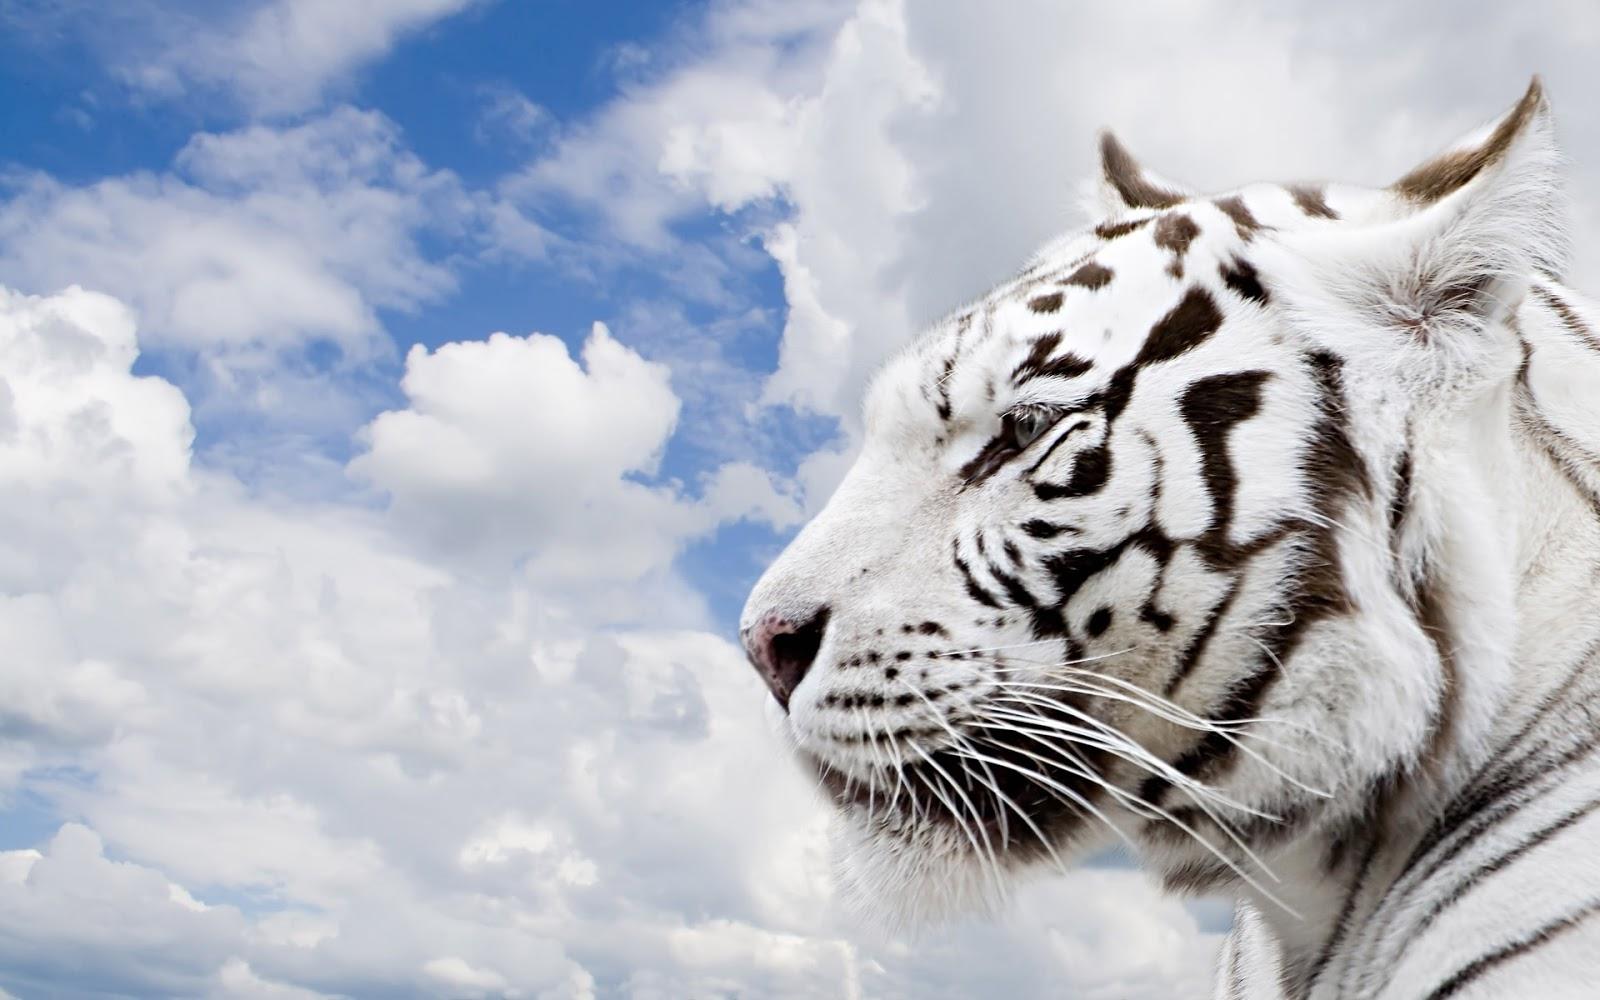 white bengal tigers hd wallpaper 2013 white bengal tigers hd wallpaper 1600x1000